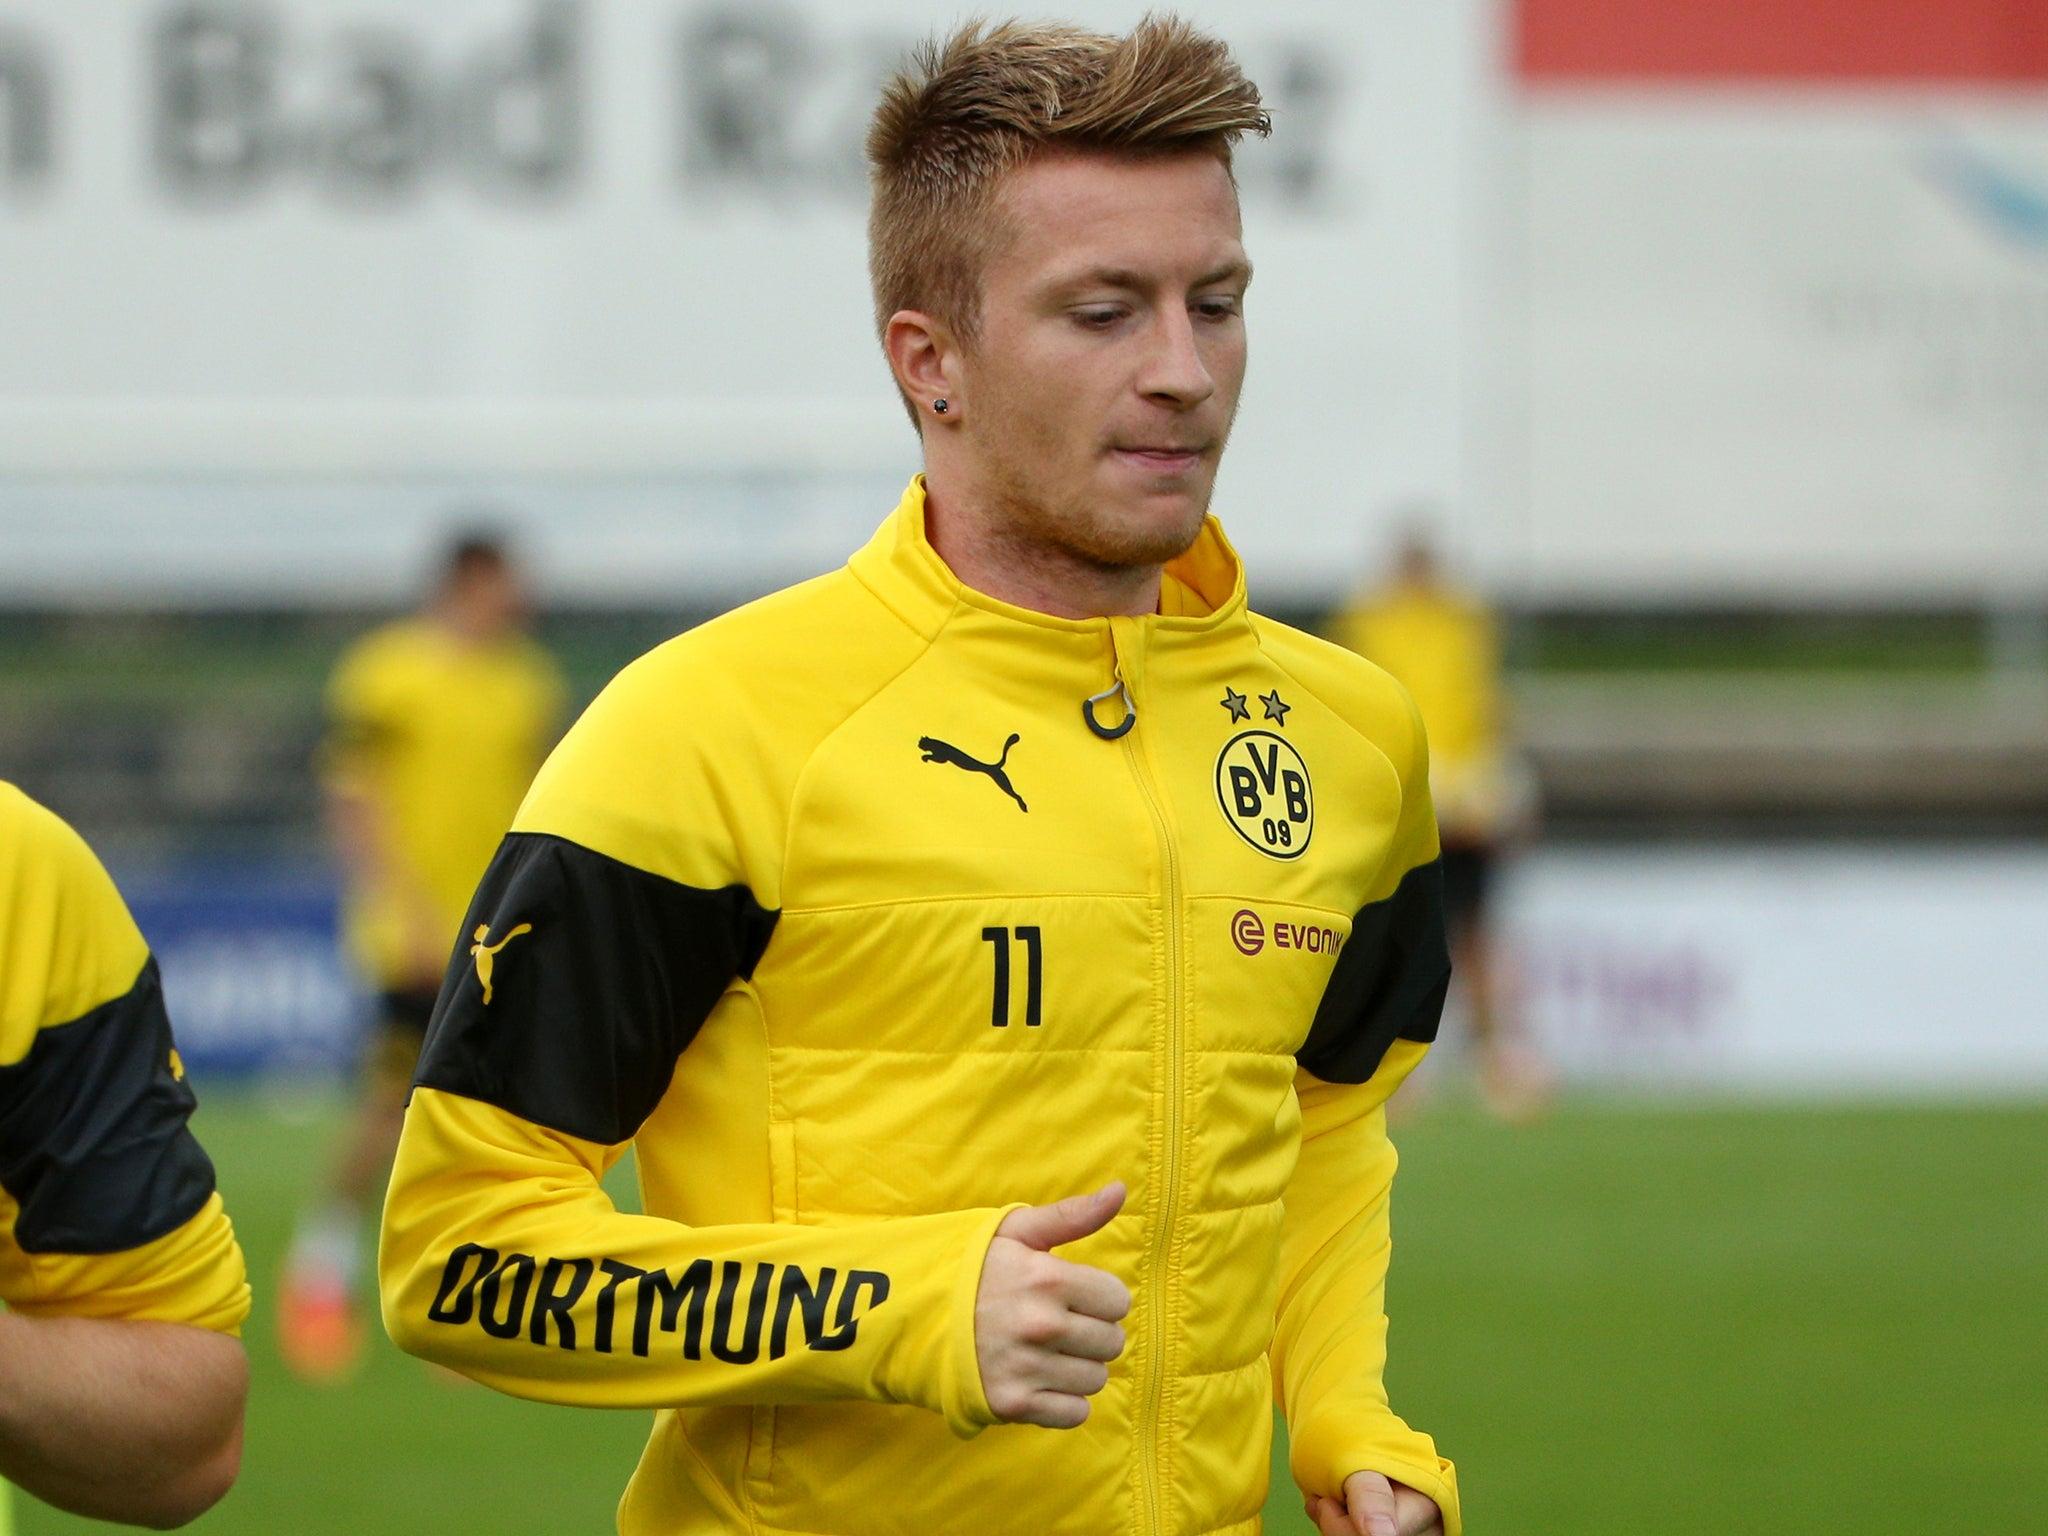 dating apps Dortmund